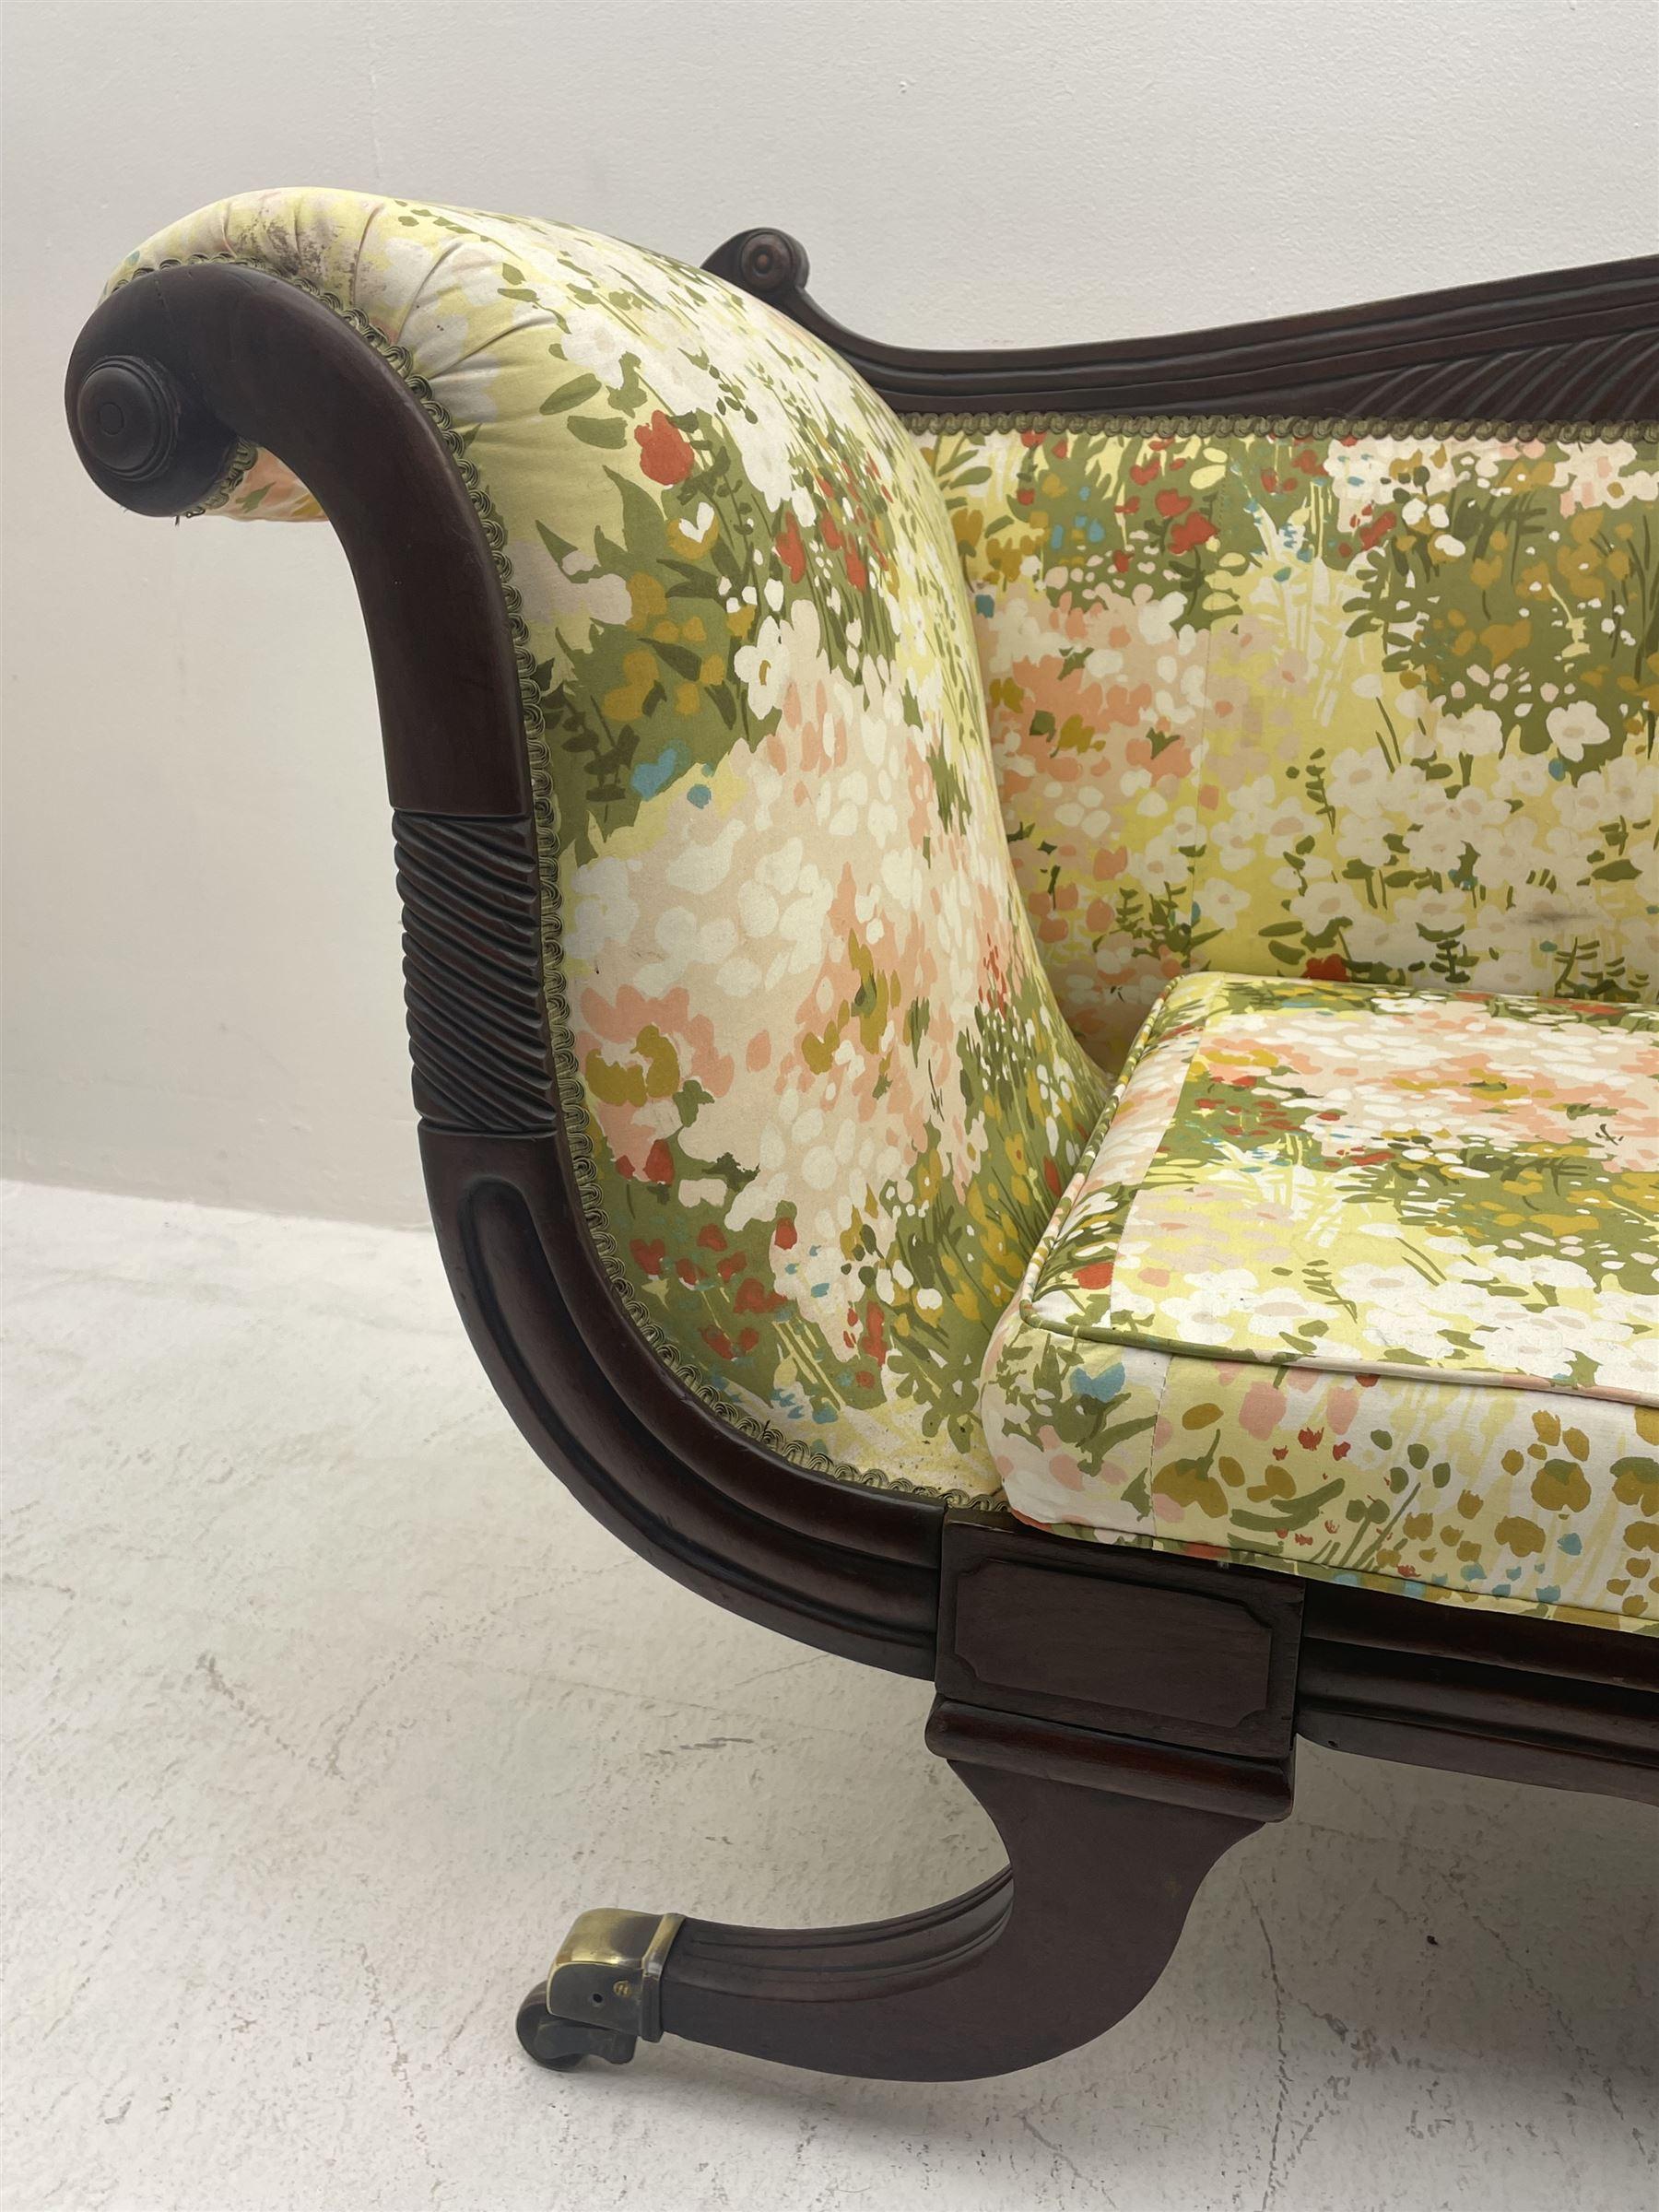 Regency period mahogany settee - Image 2 of 5